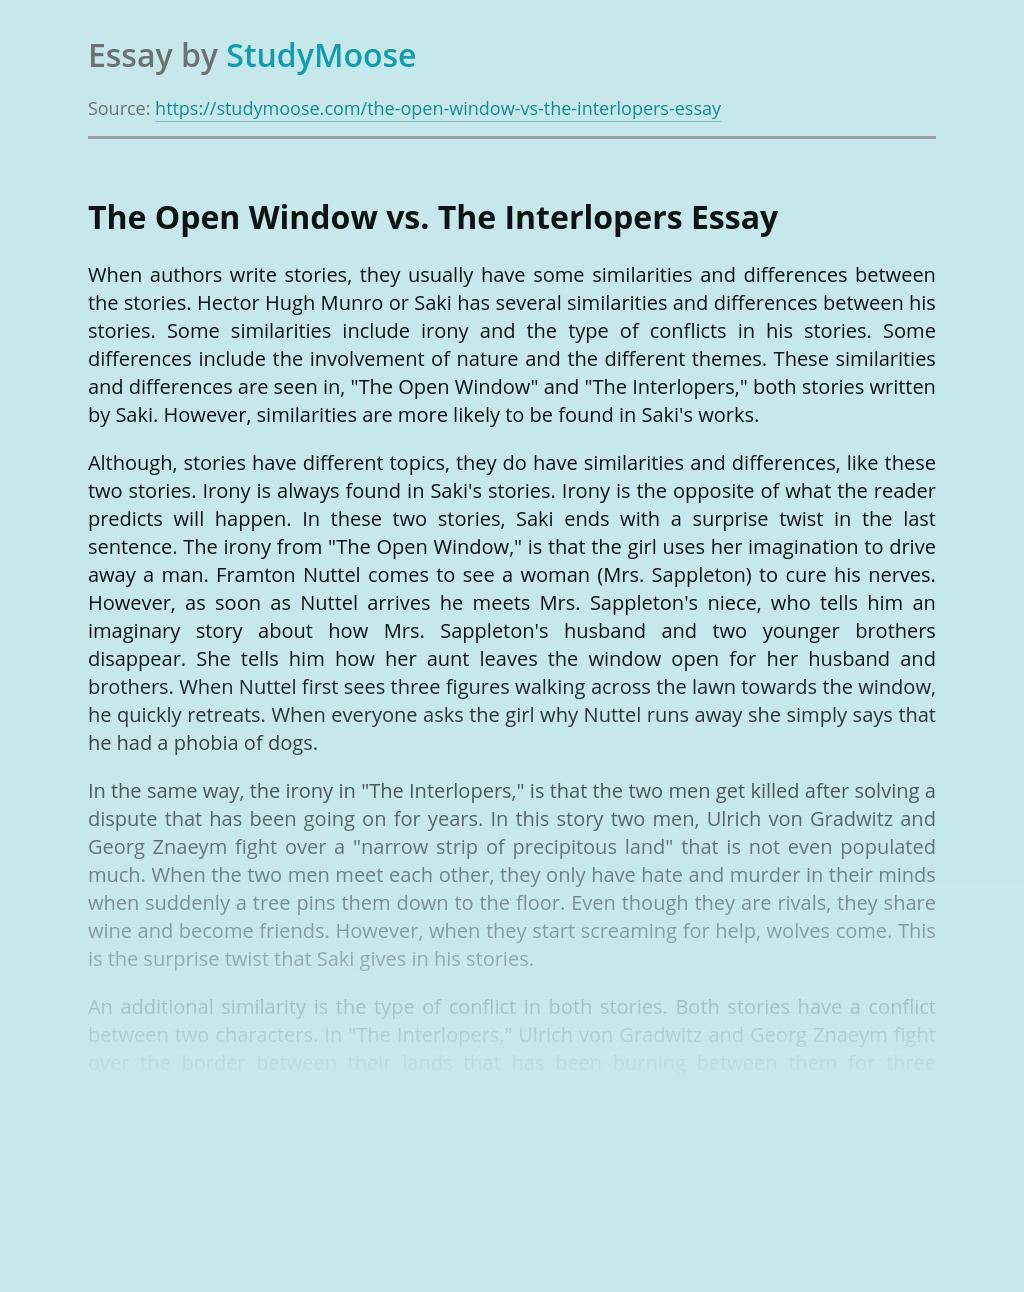 The Open Window vs. The Interlopers Short Stories Comparison